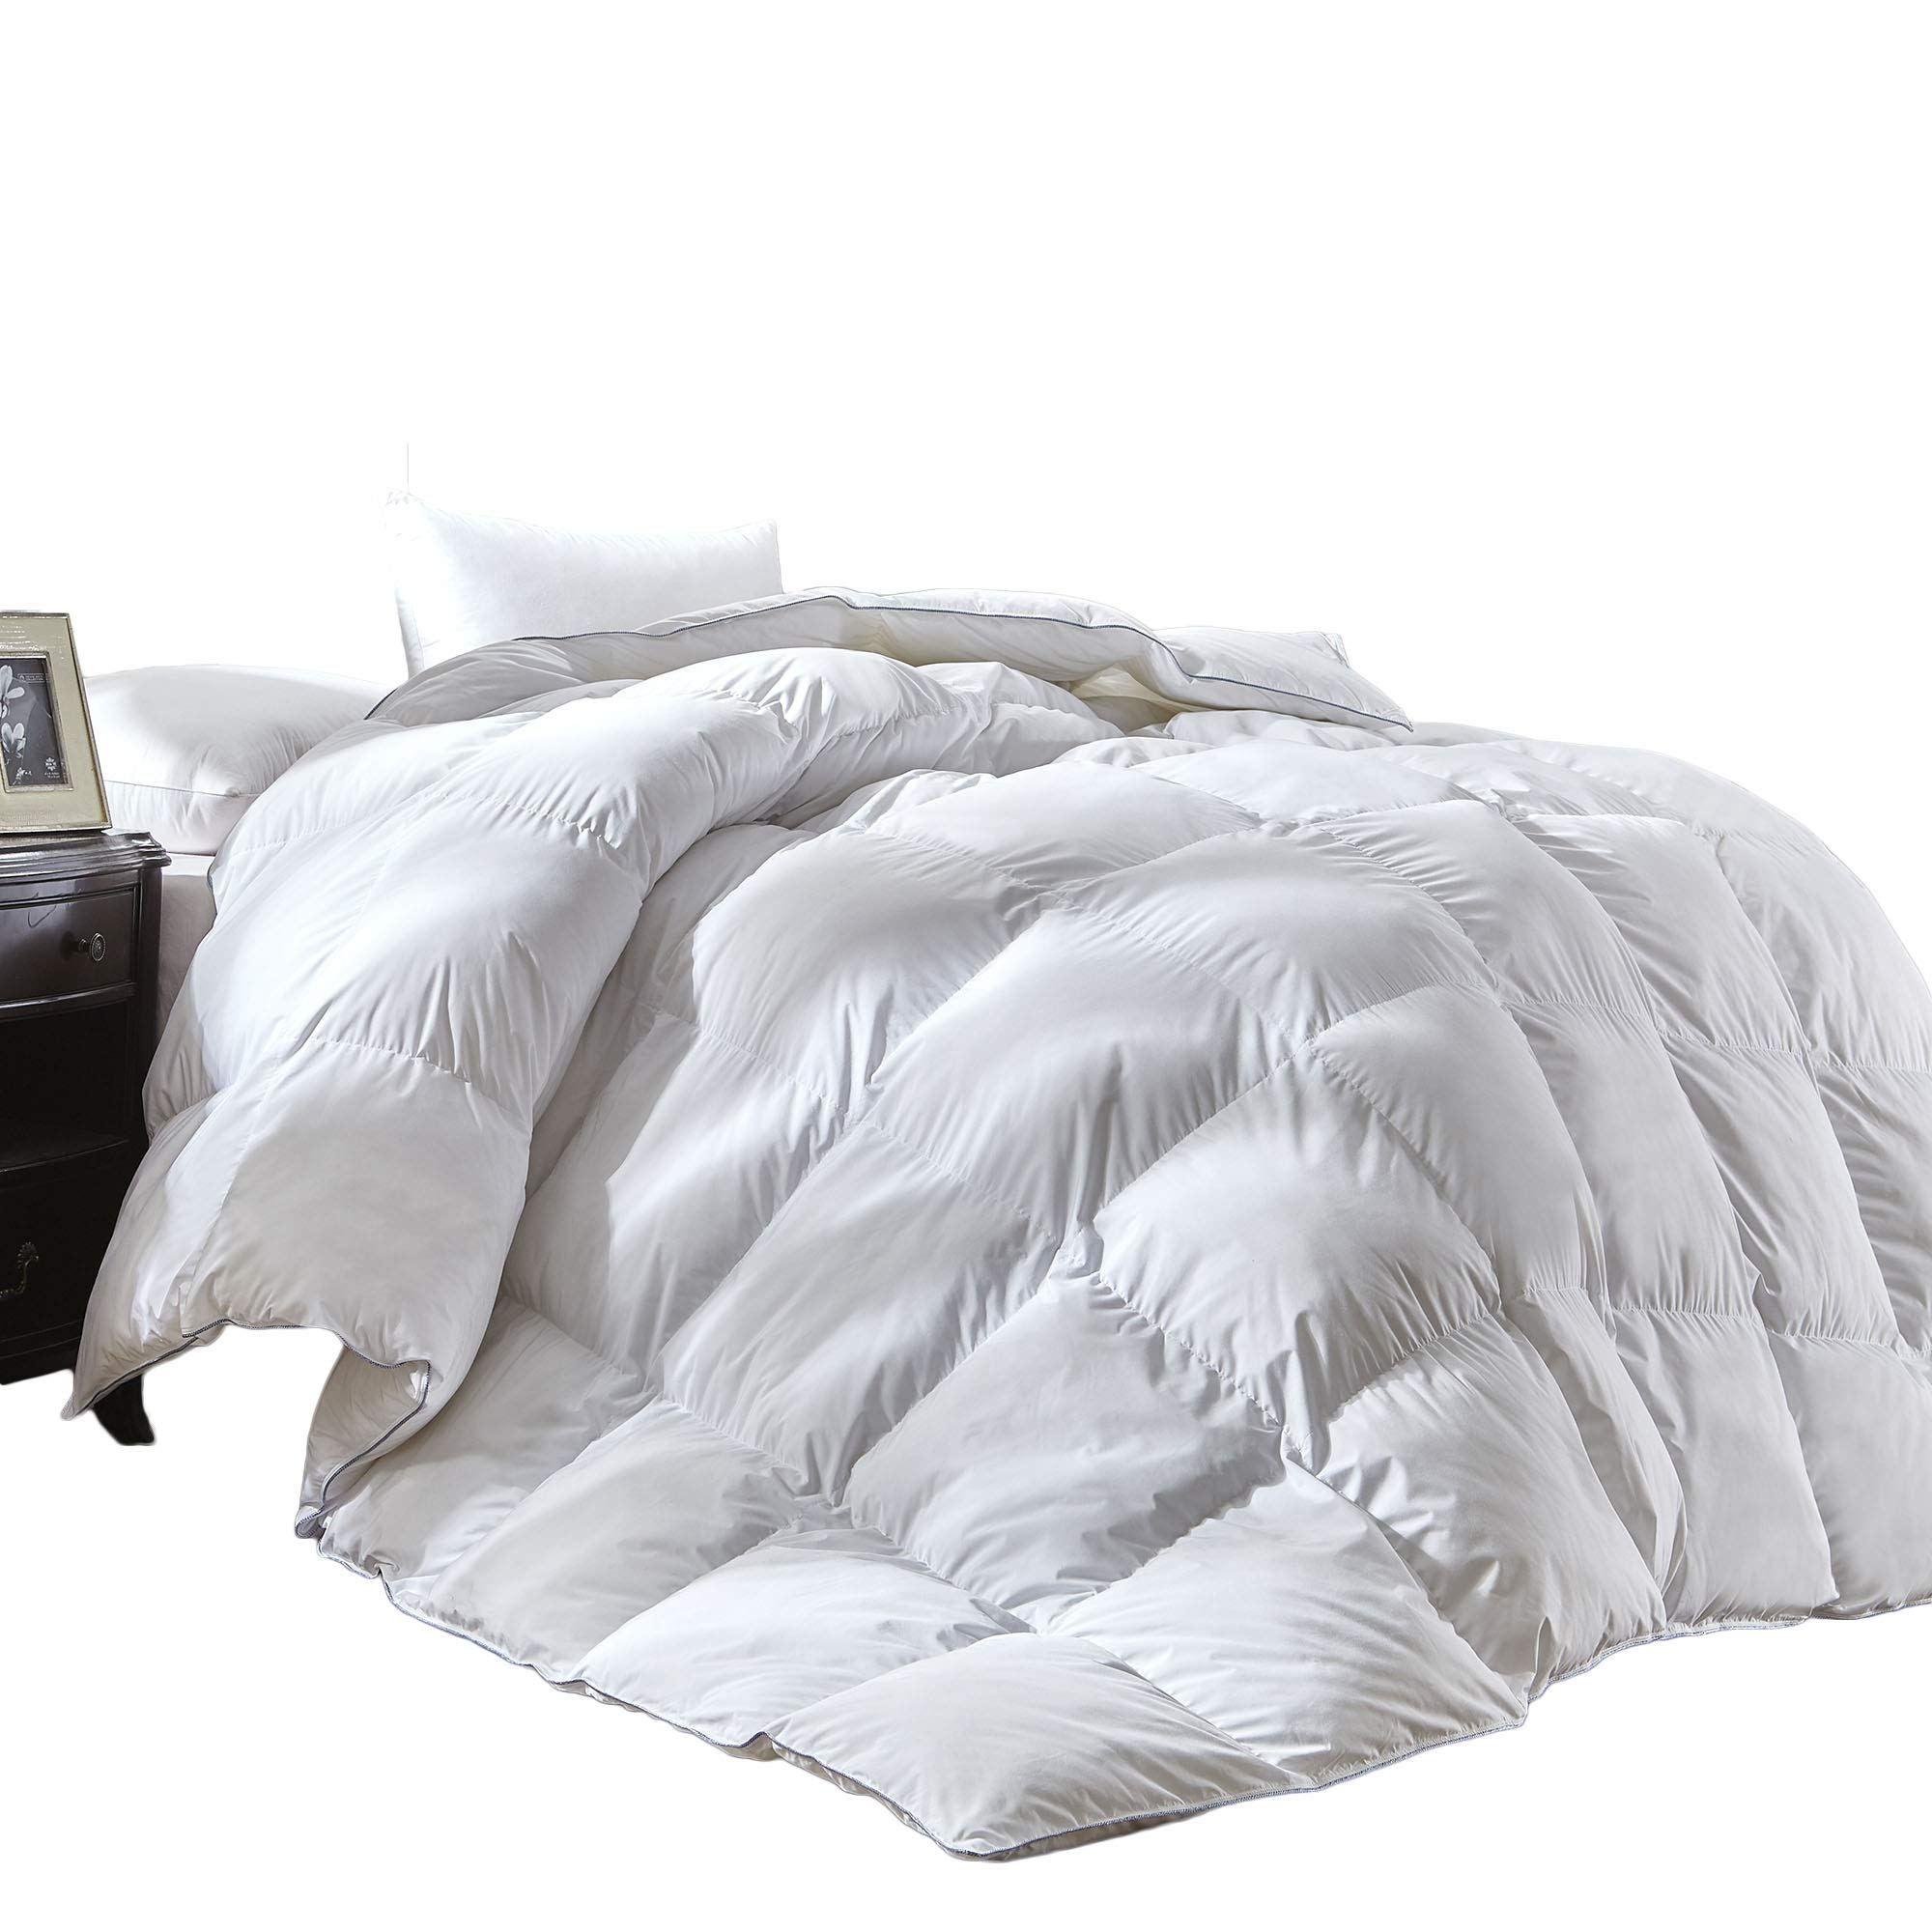 Luxury Queen Size White Goose Down Feather Comforter Duvet Insert